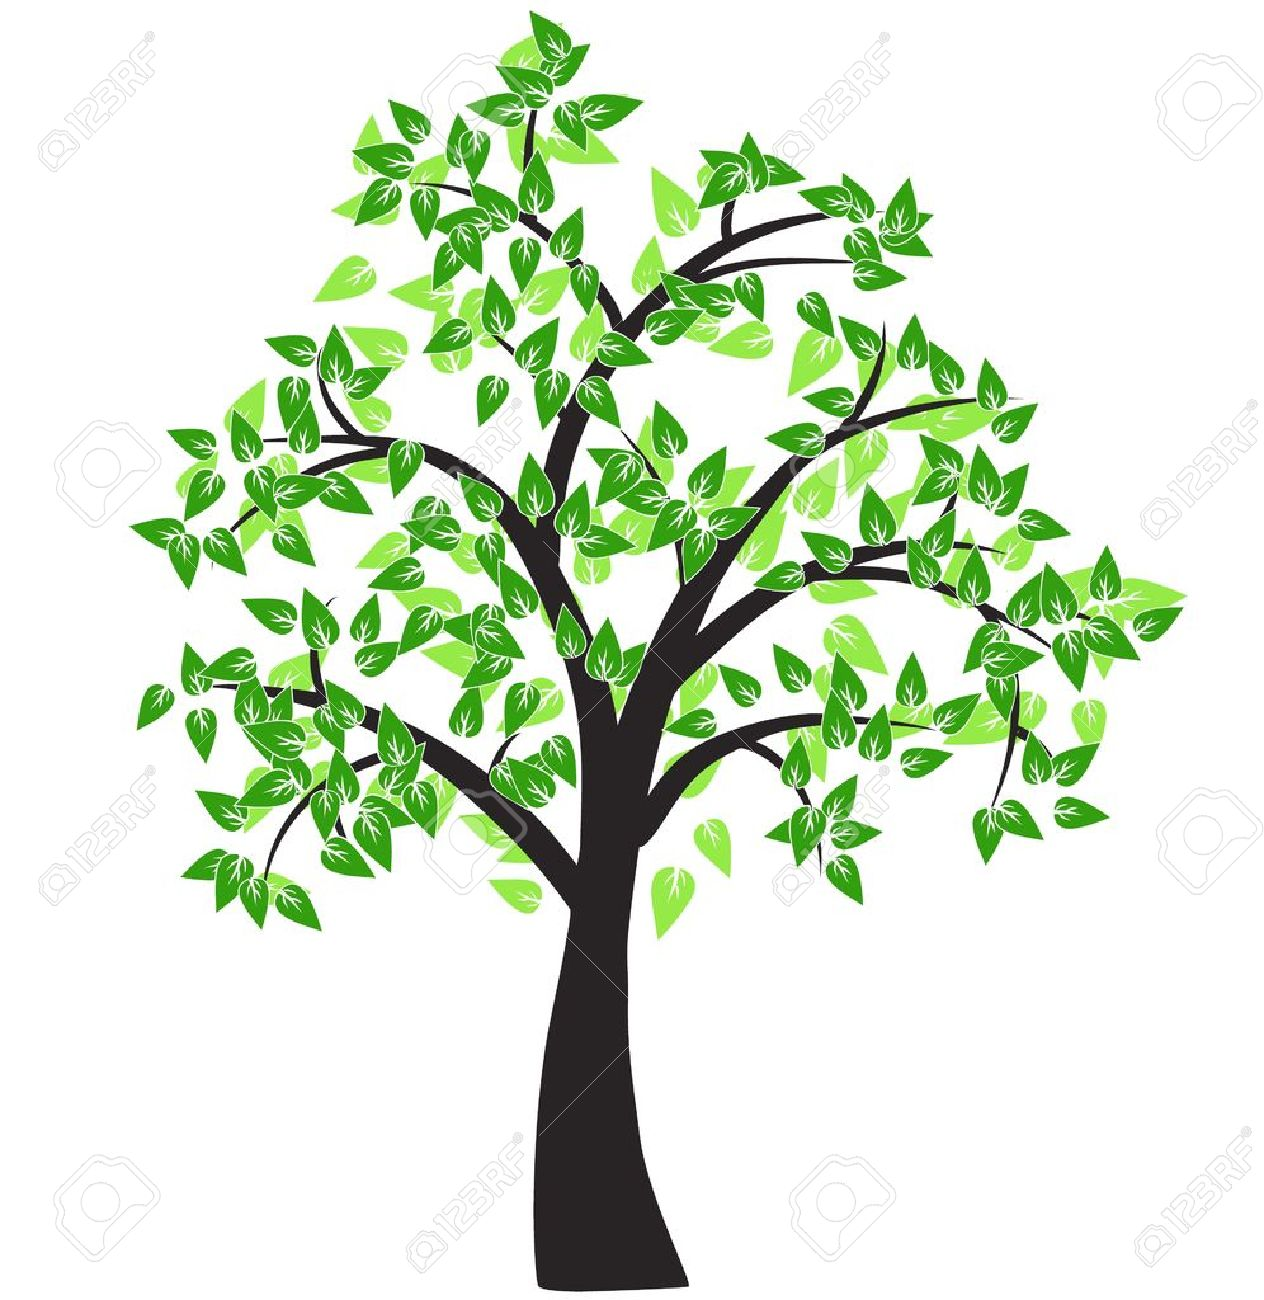 in a plants stl o model pot decor lwo max fbx obj ma decorative small htm tree